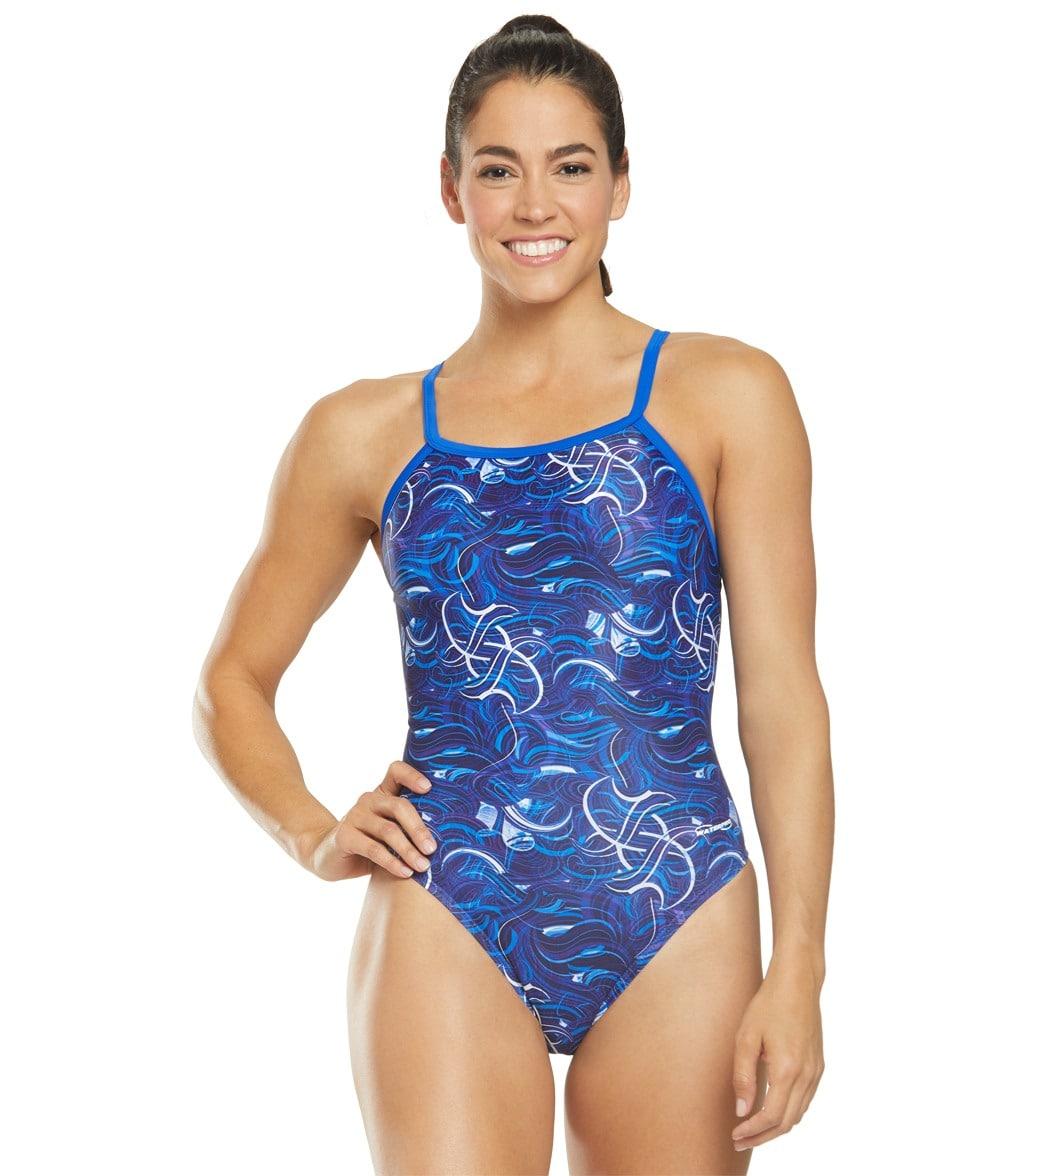 42c7a827d Waterpro Women's Torrent One Piece Swimsuit at SwimOutlet.com